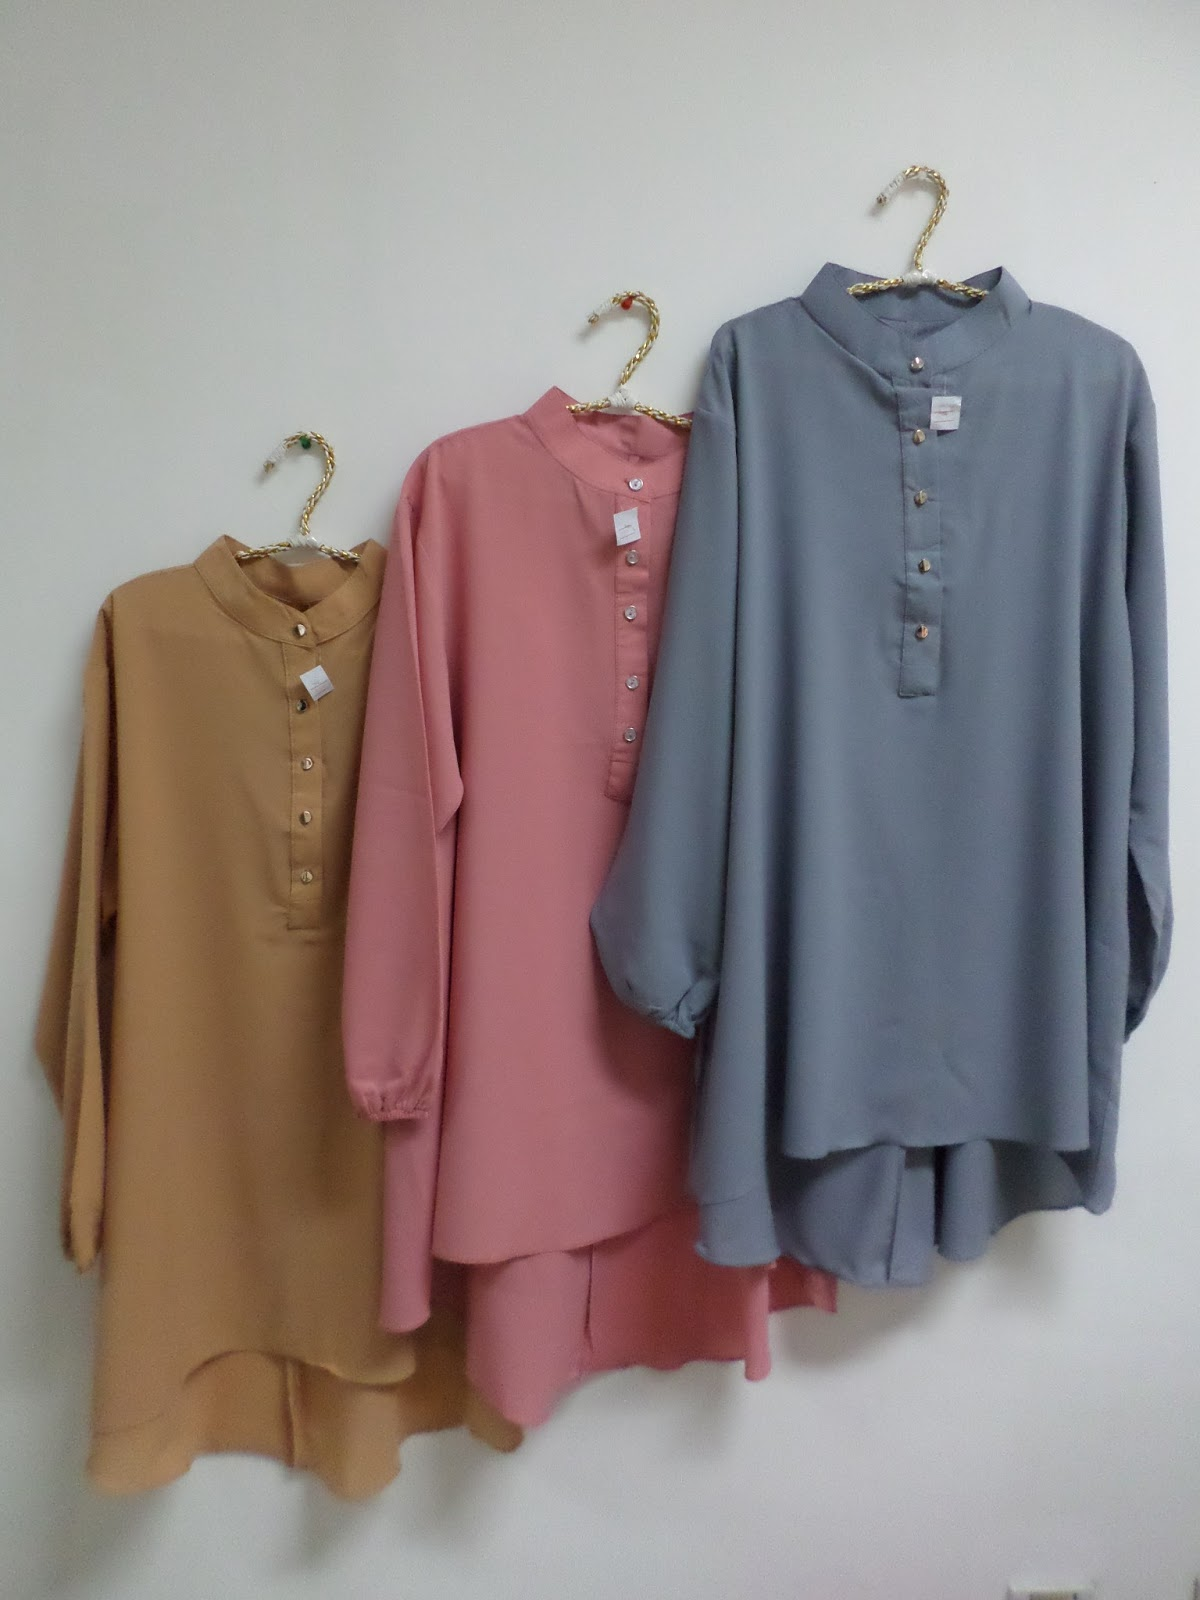 bahan yang digunakan untuk membuat model blouse wanita